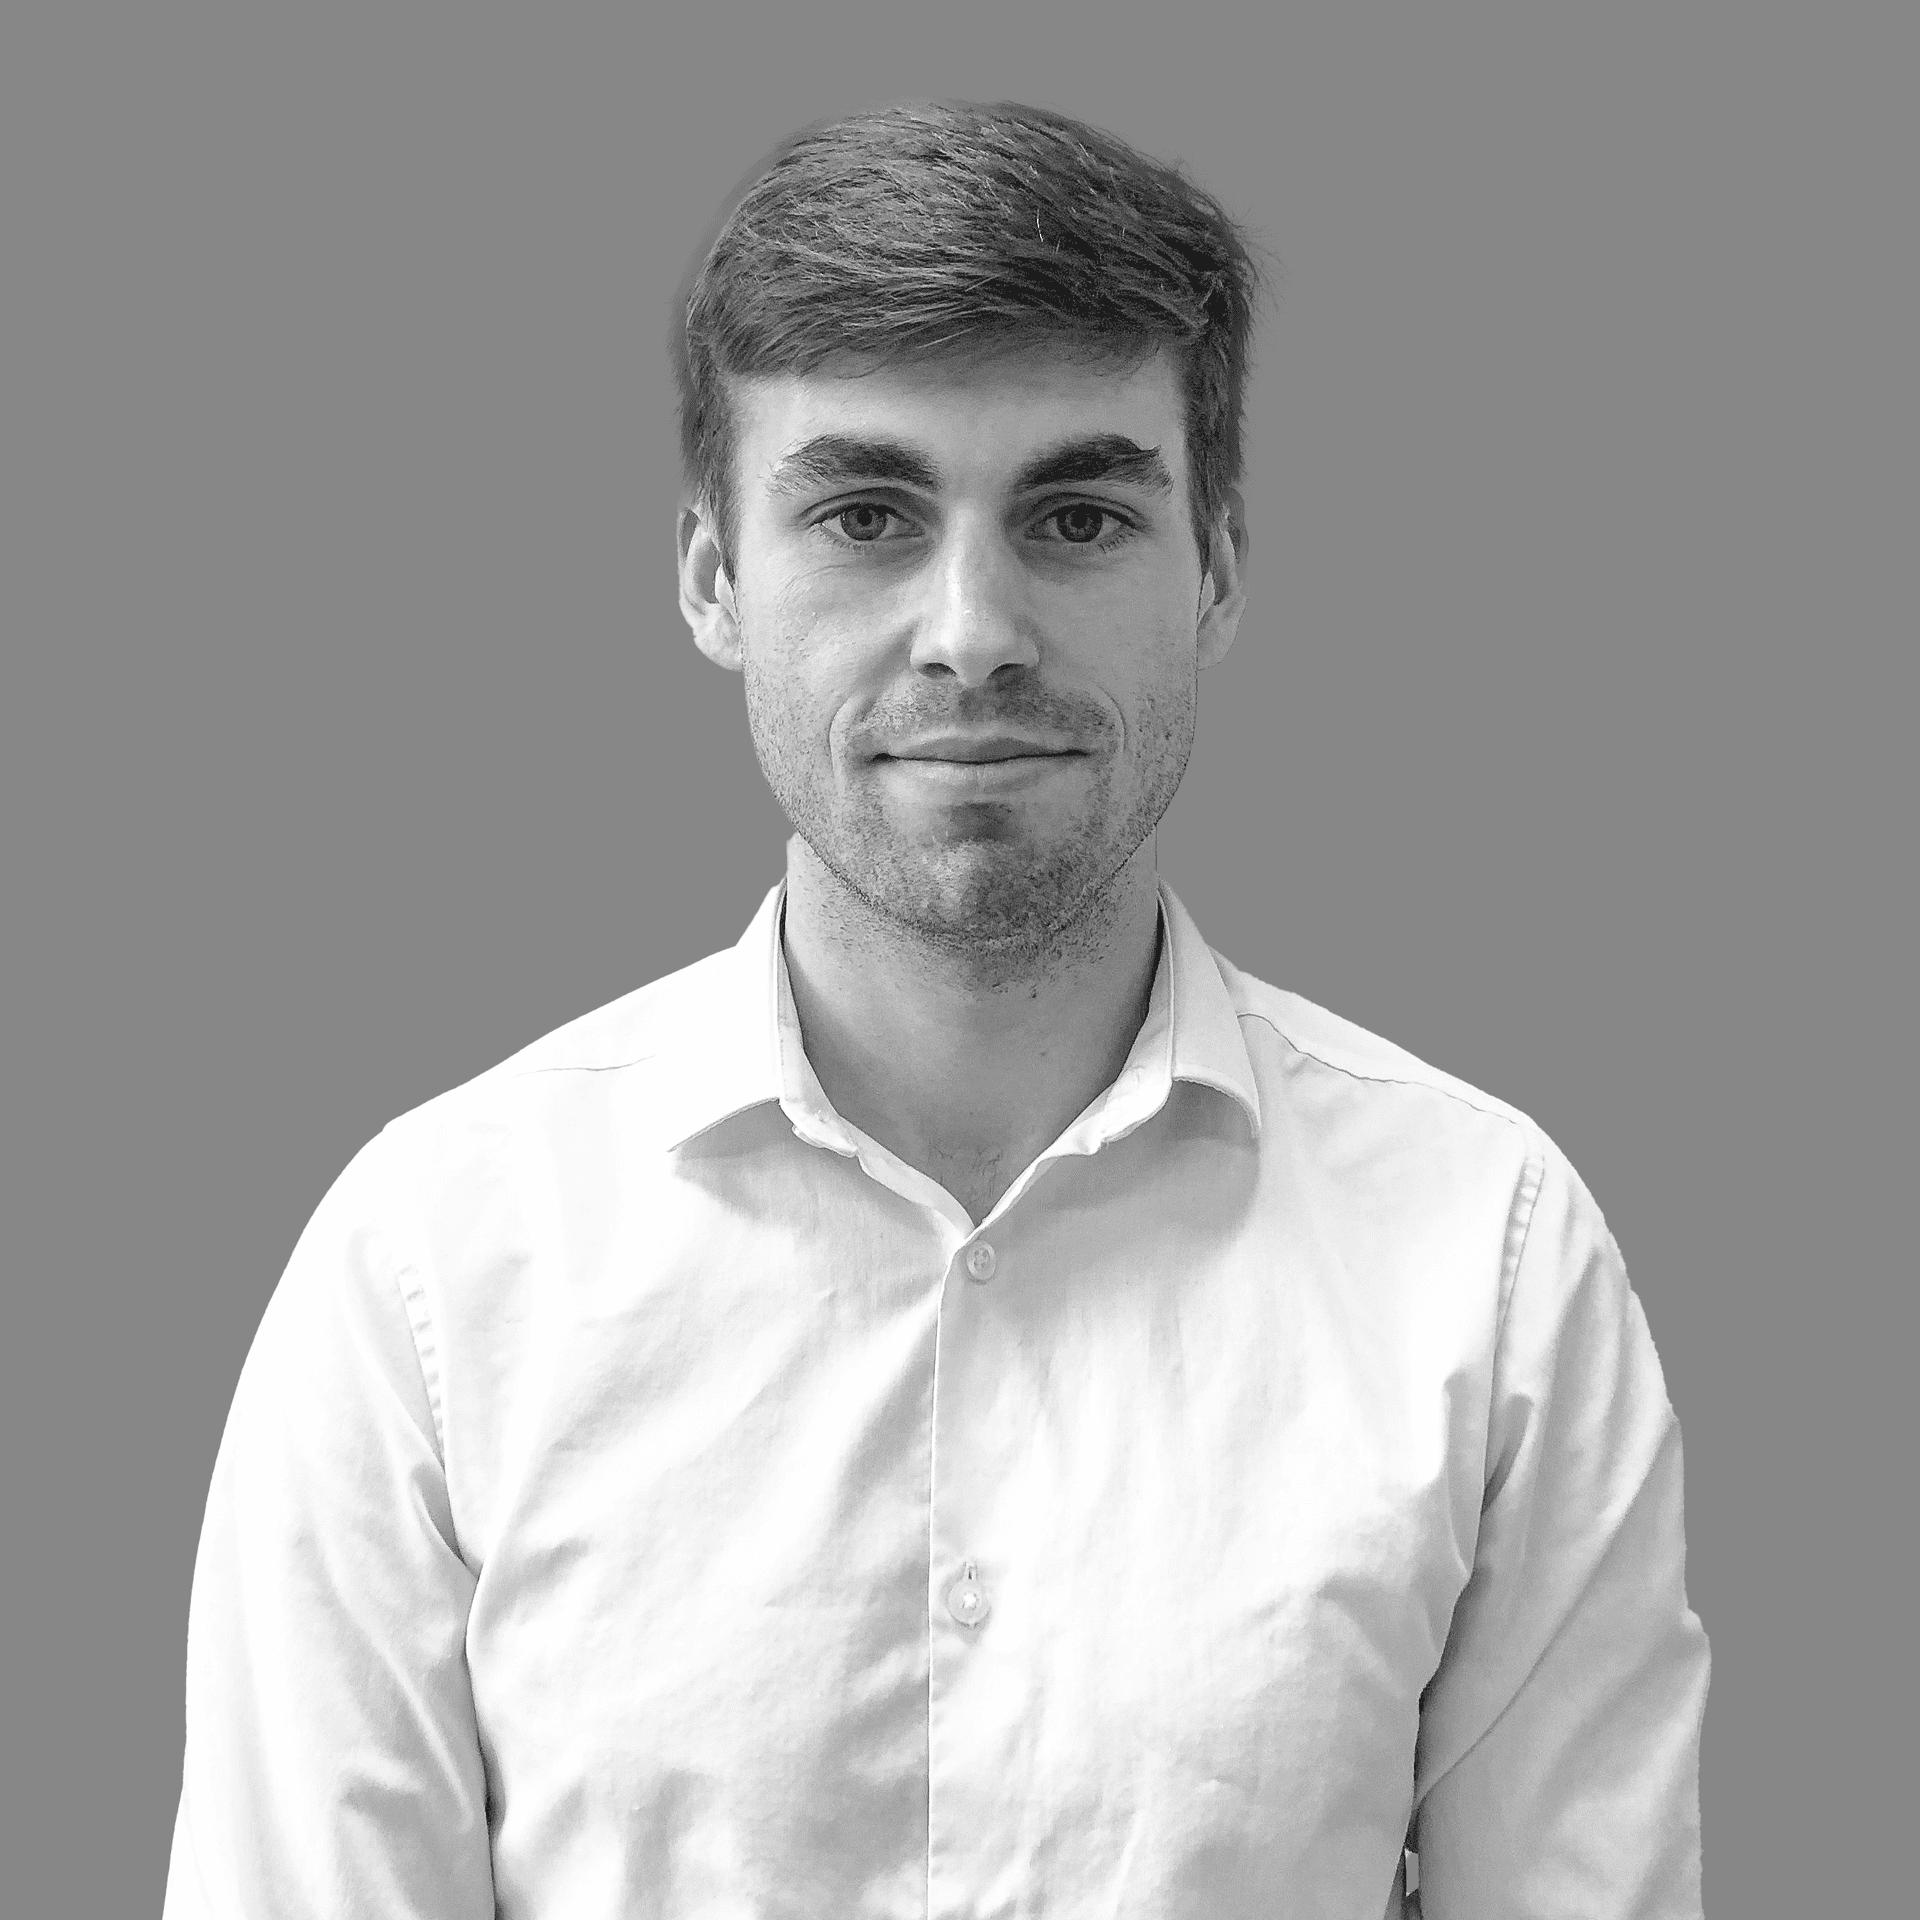 Marlin Hawk London's Researcher Tristan Lundqvist